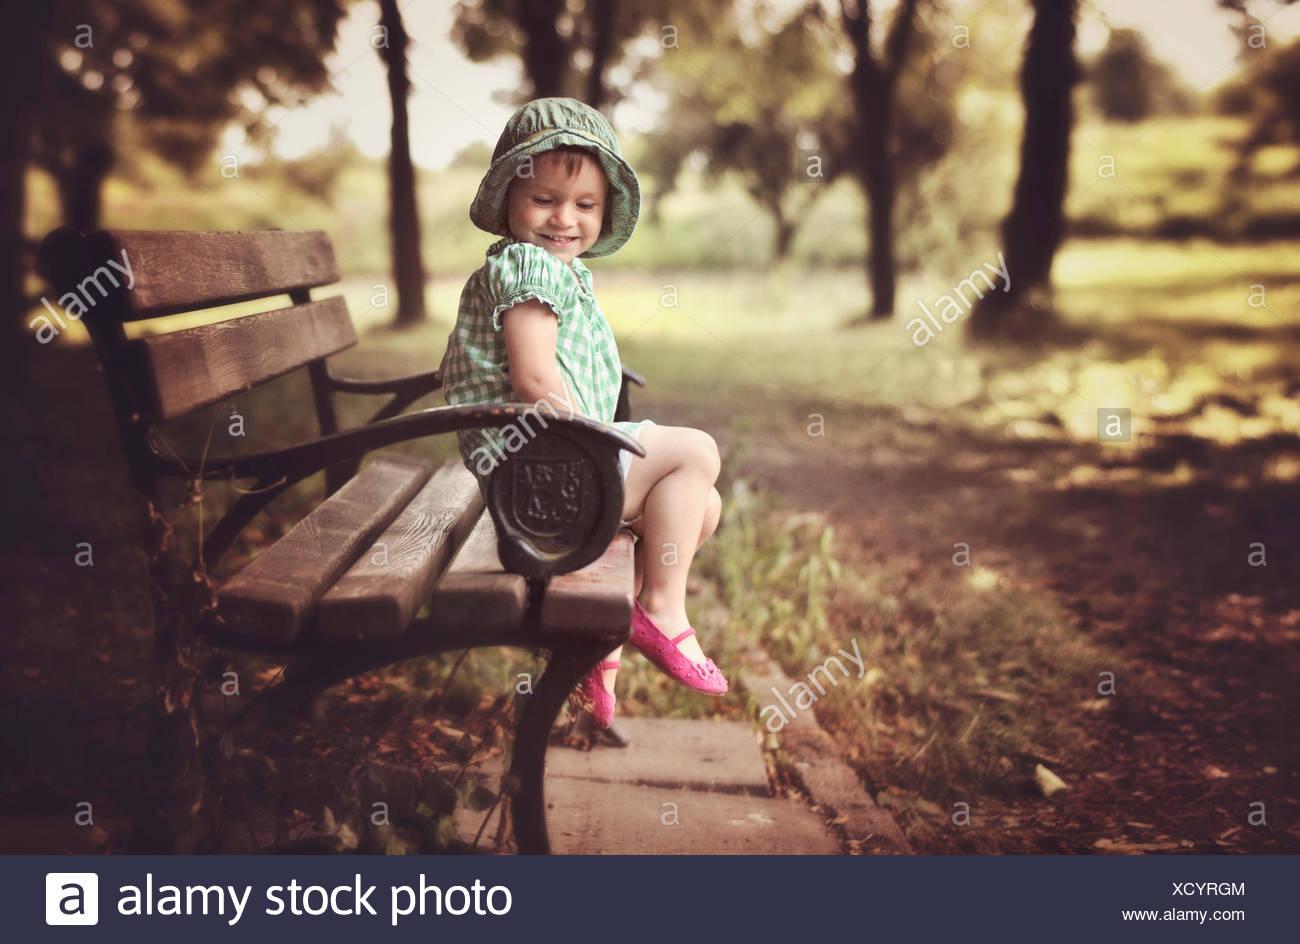 Girl on Bench - Stock Image